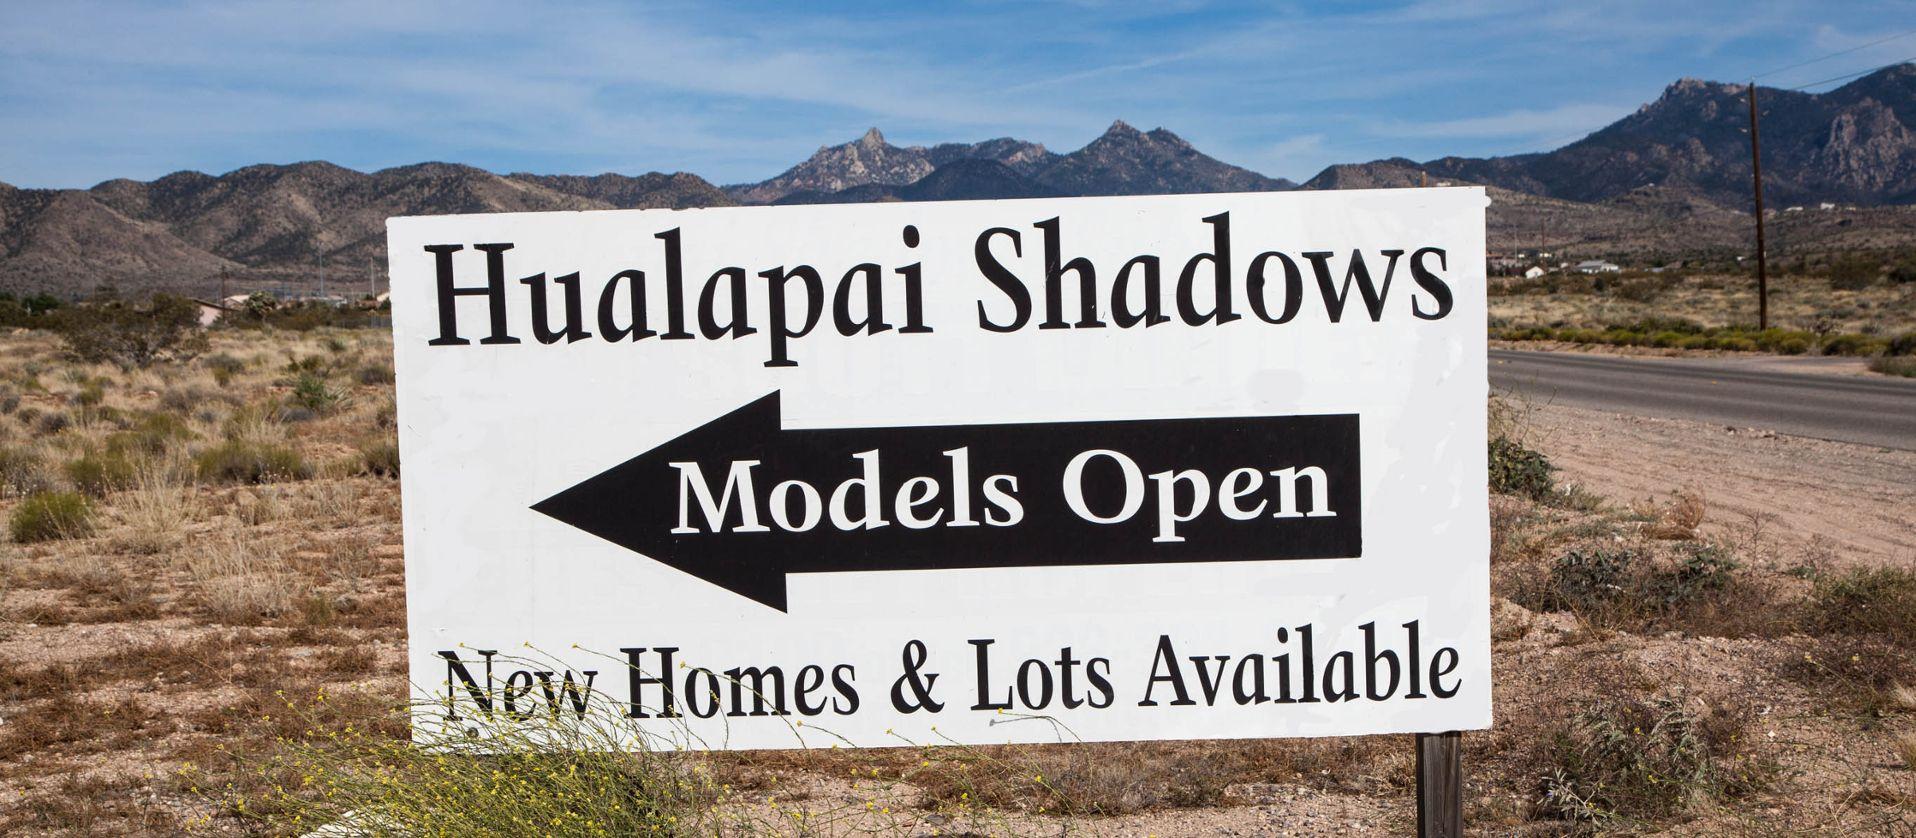 Hualapai Shadows